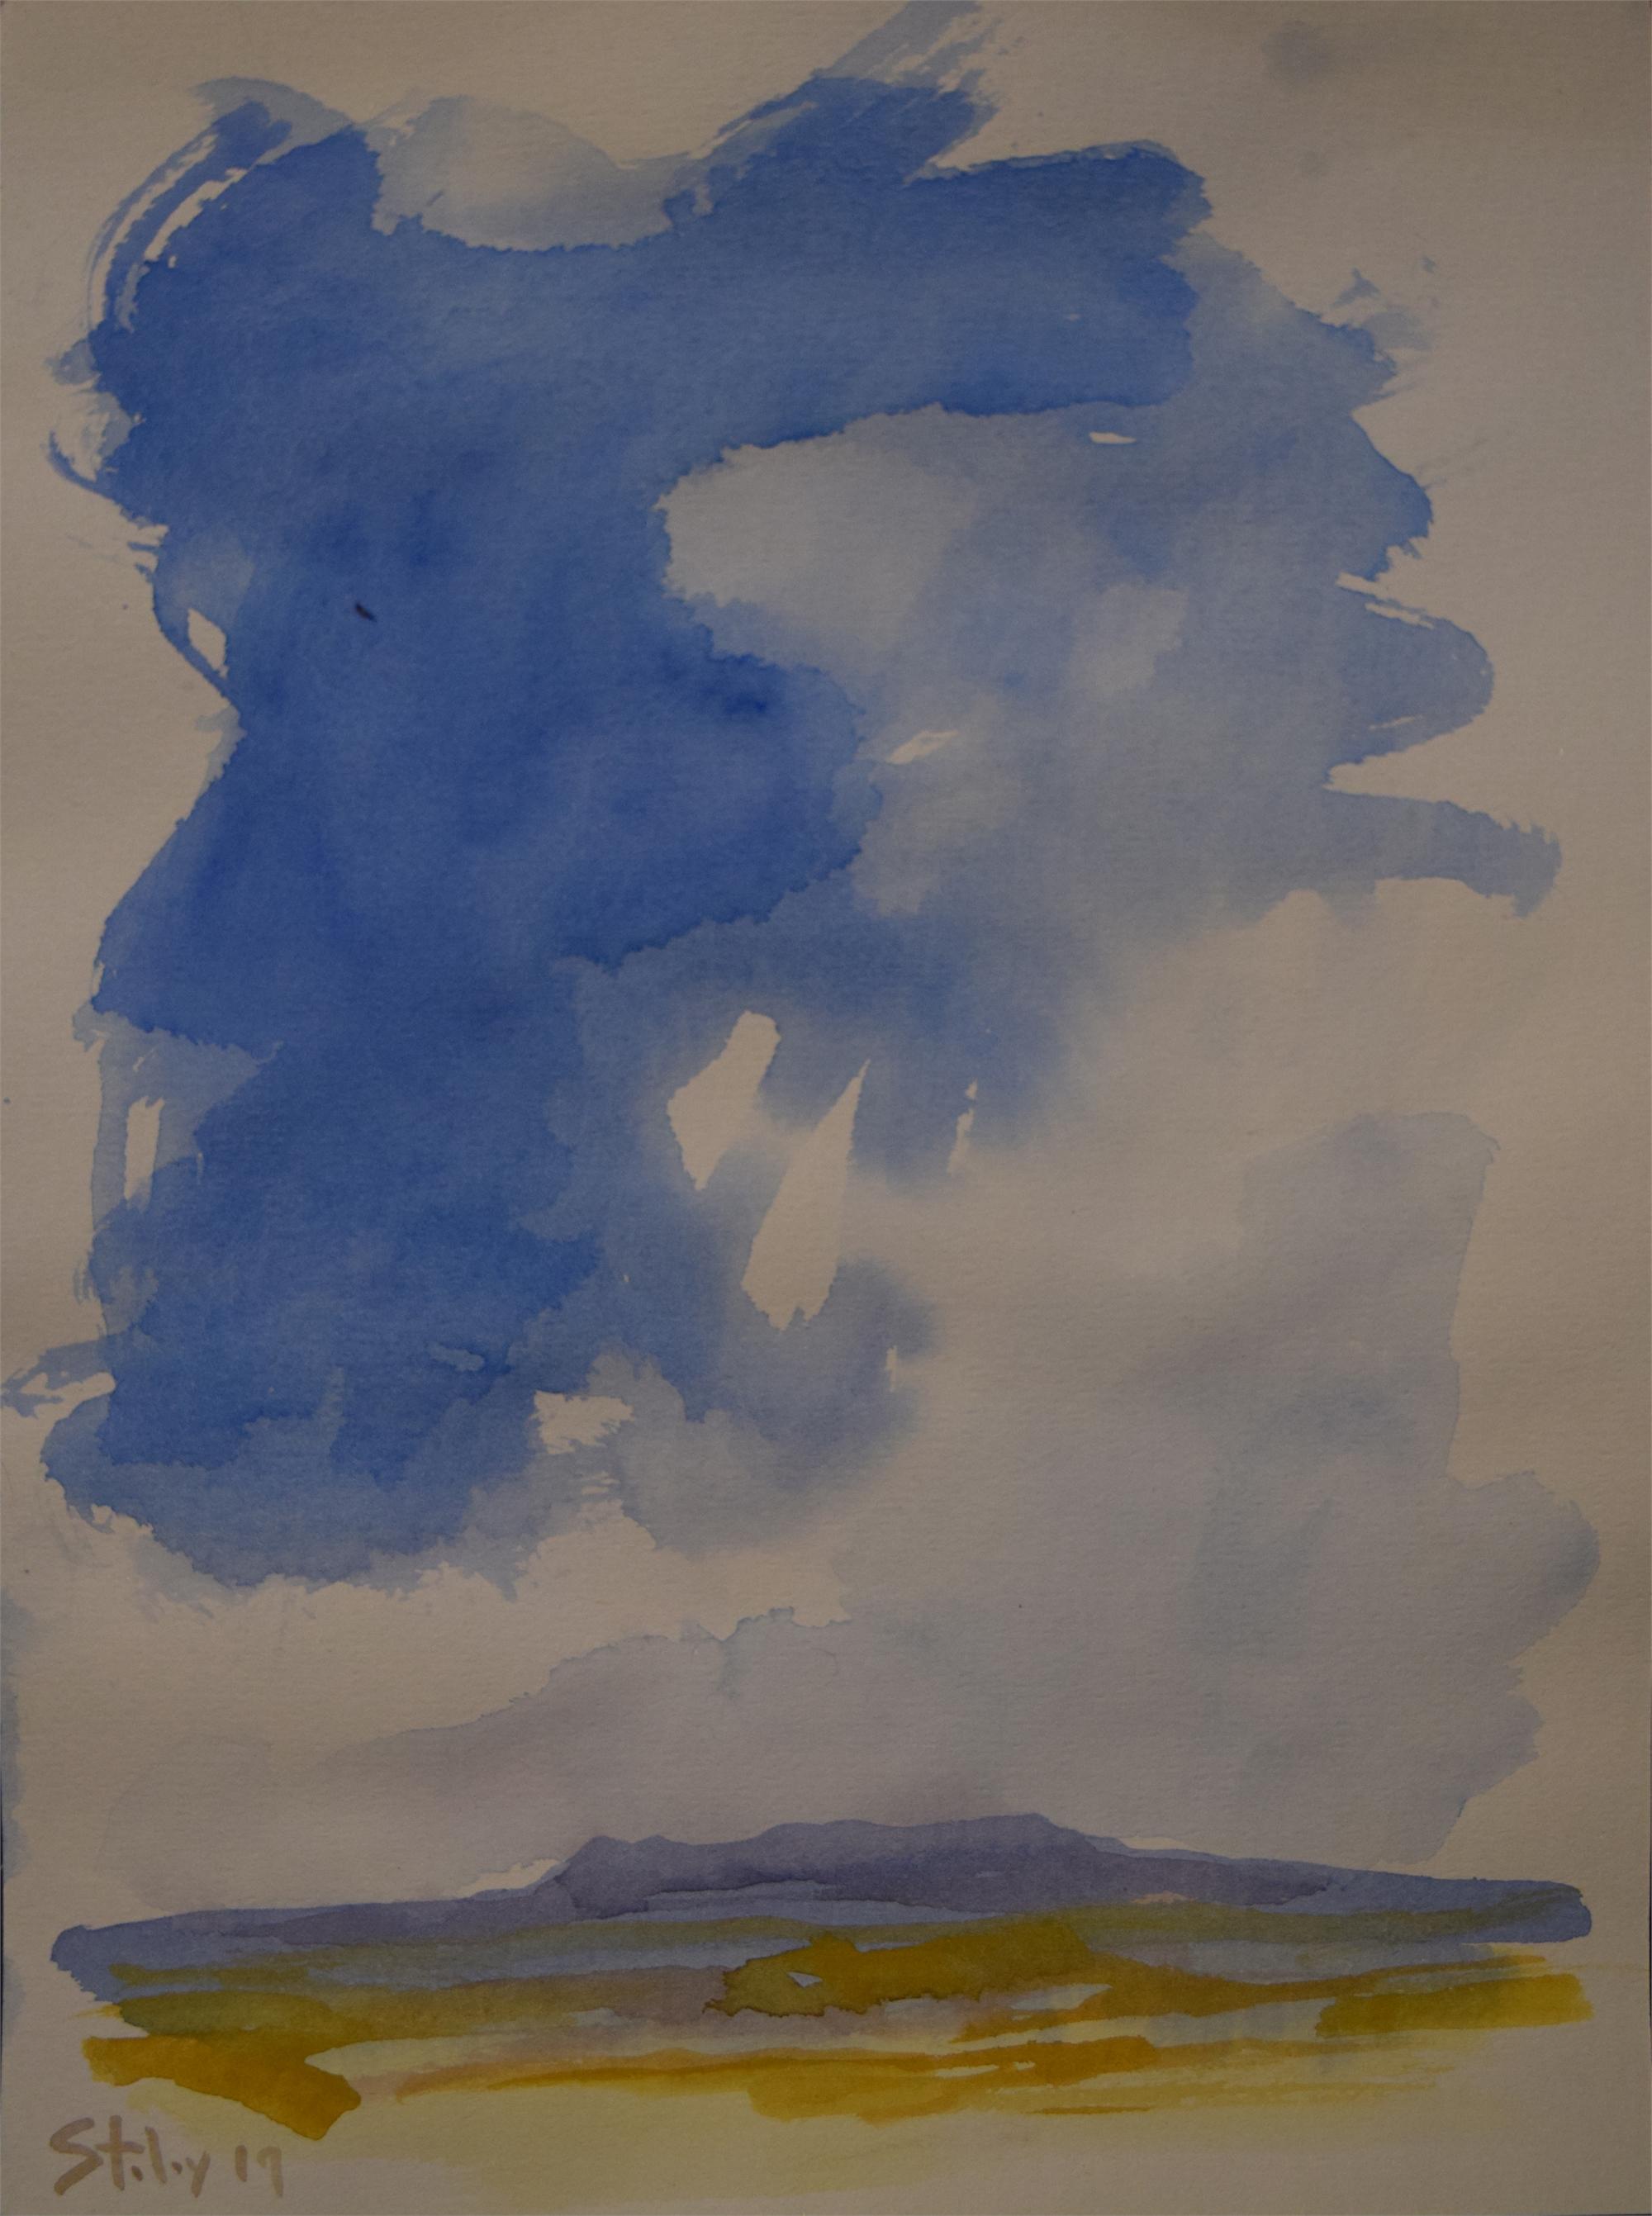 Big Bend 7 by Earl Staley